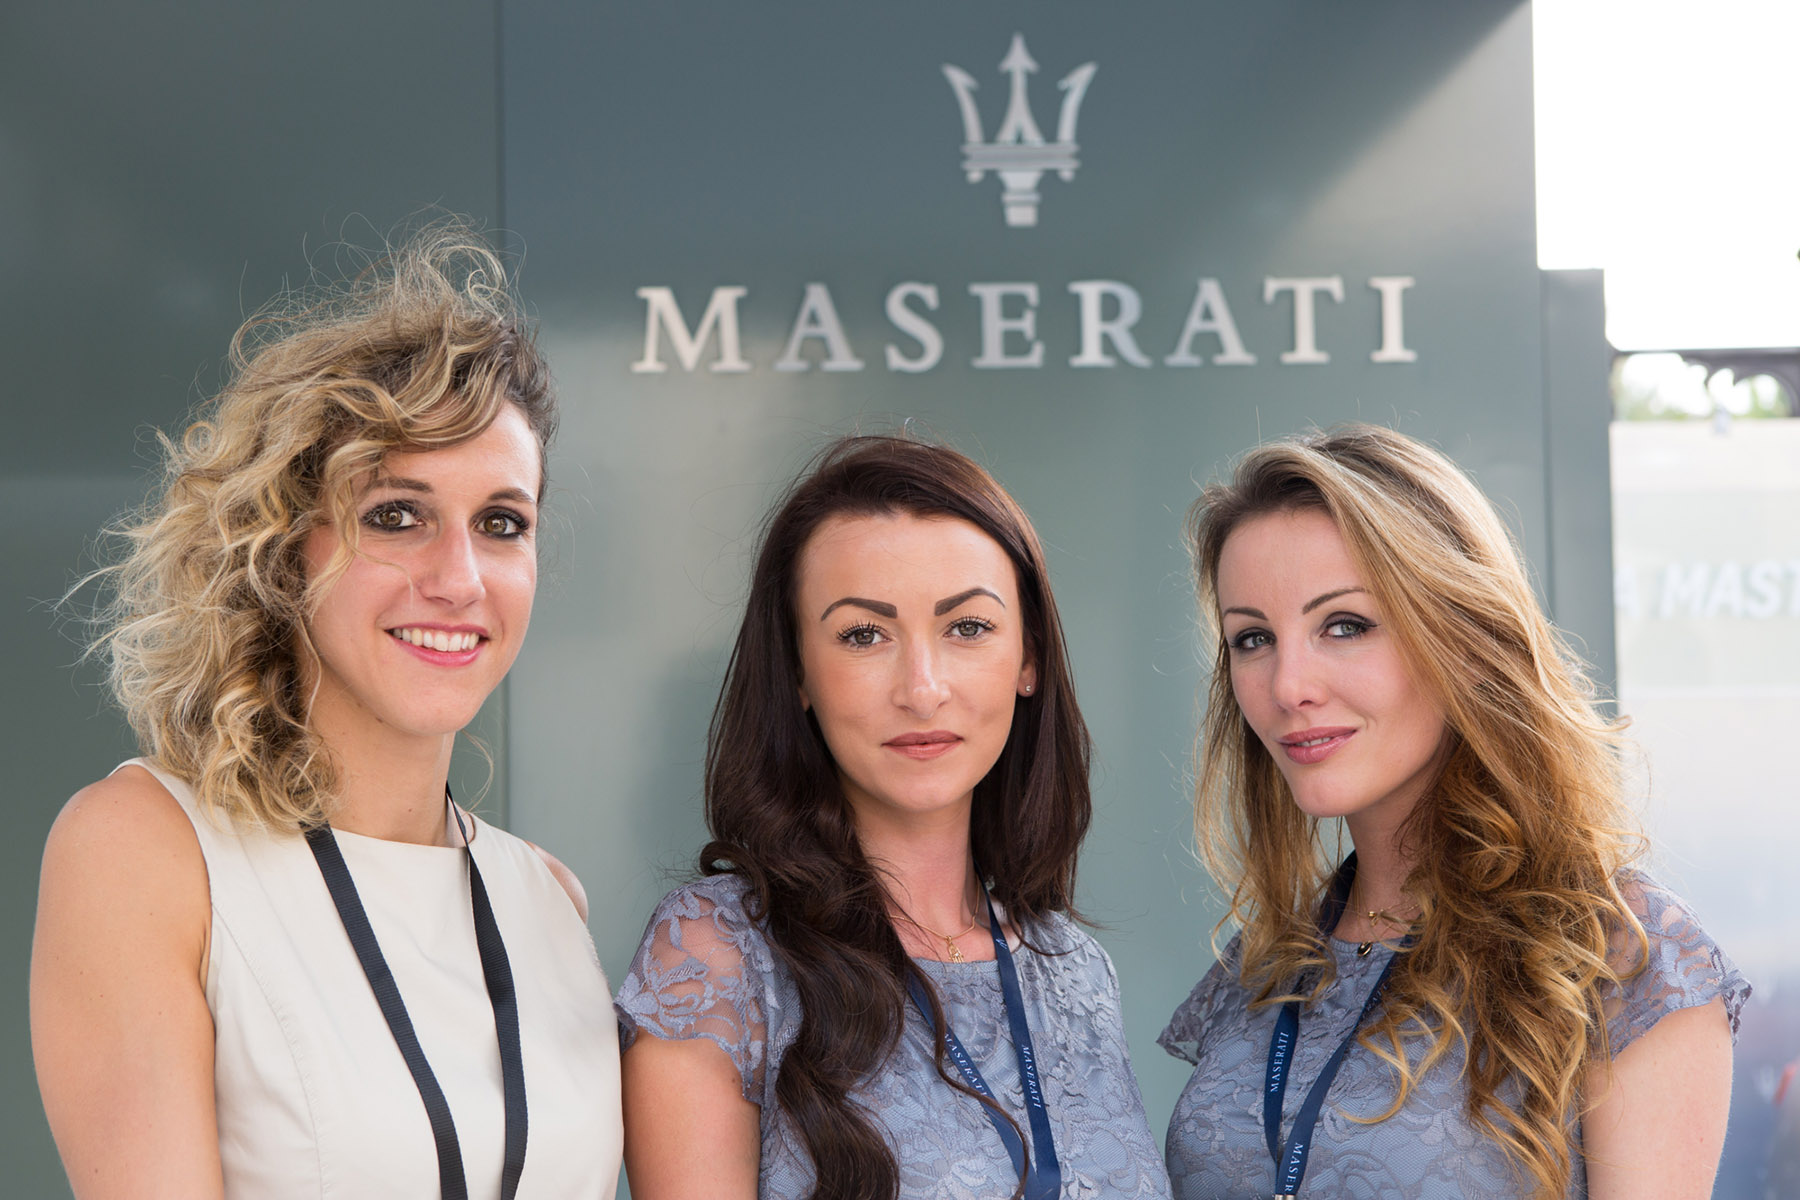 Sales ladies of Maserati at Art Dubai by Loesje Kessels Fashion Photographer